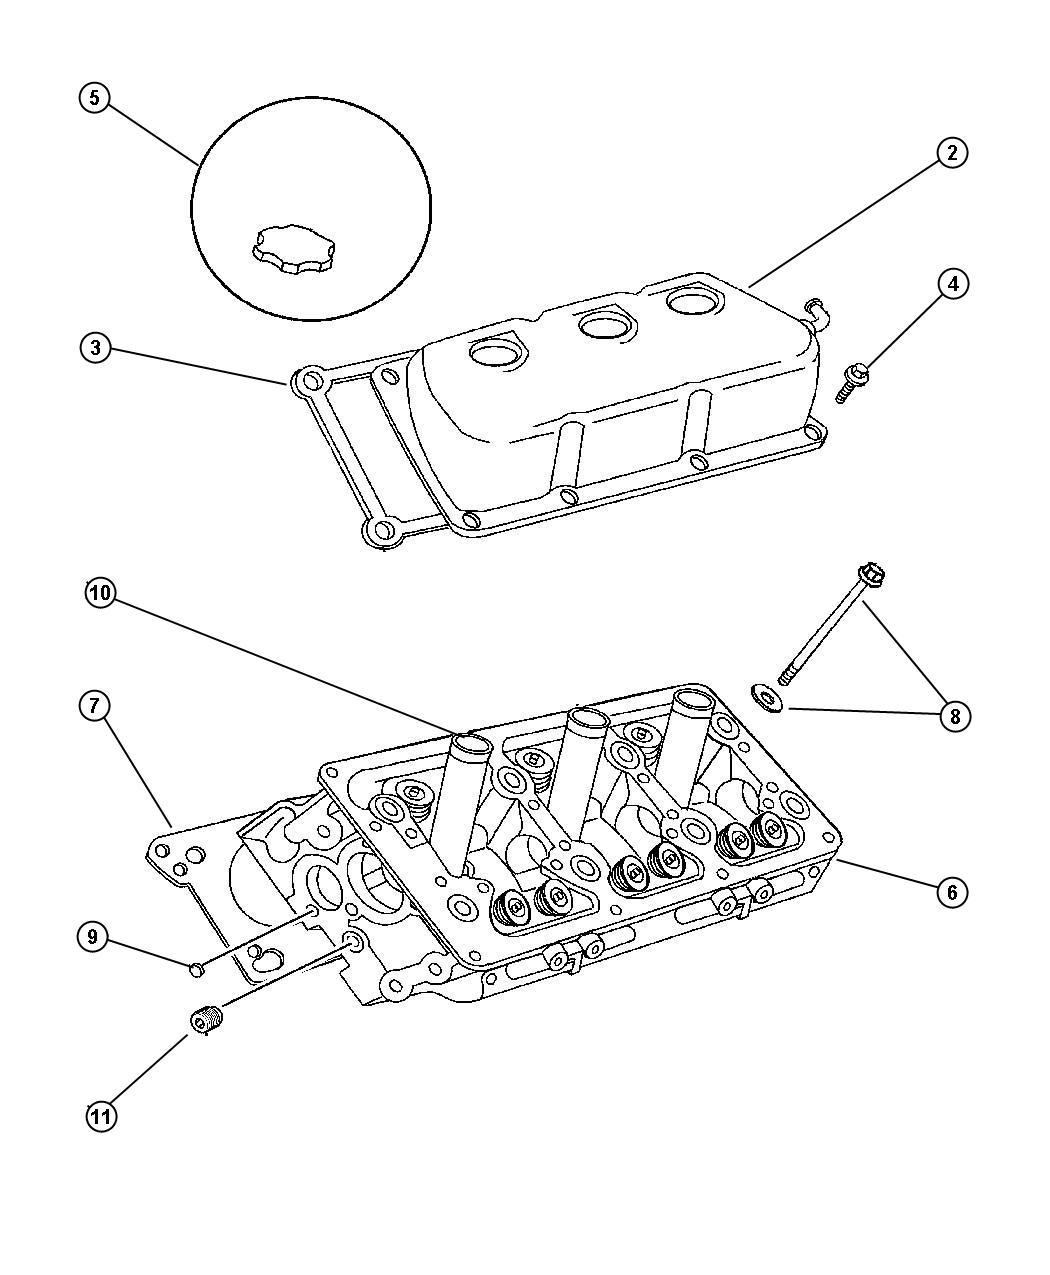 Chrysler Lhs Seal Spark Plug Tube